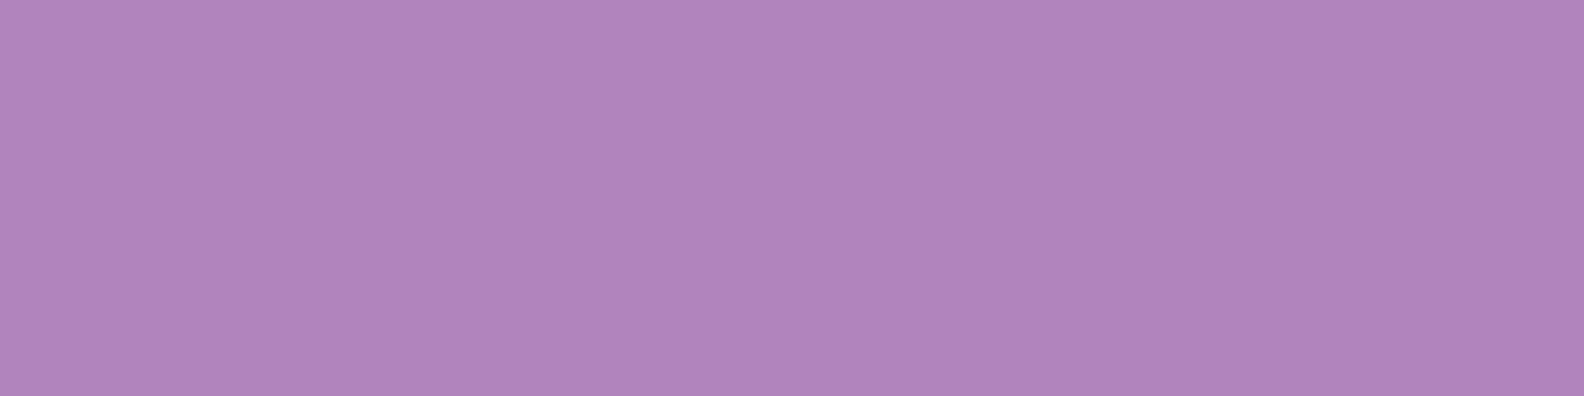 1584x396 African Violet Solid Color Background